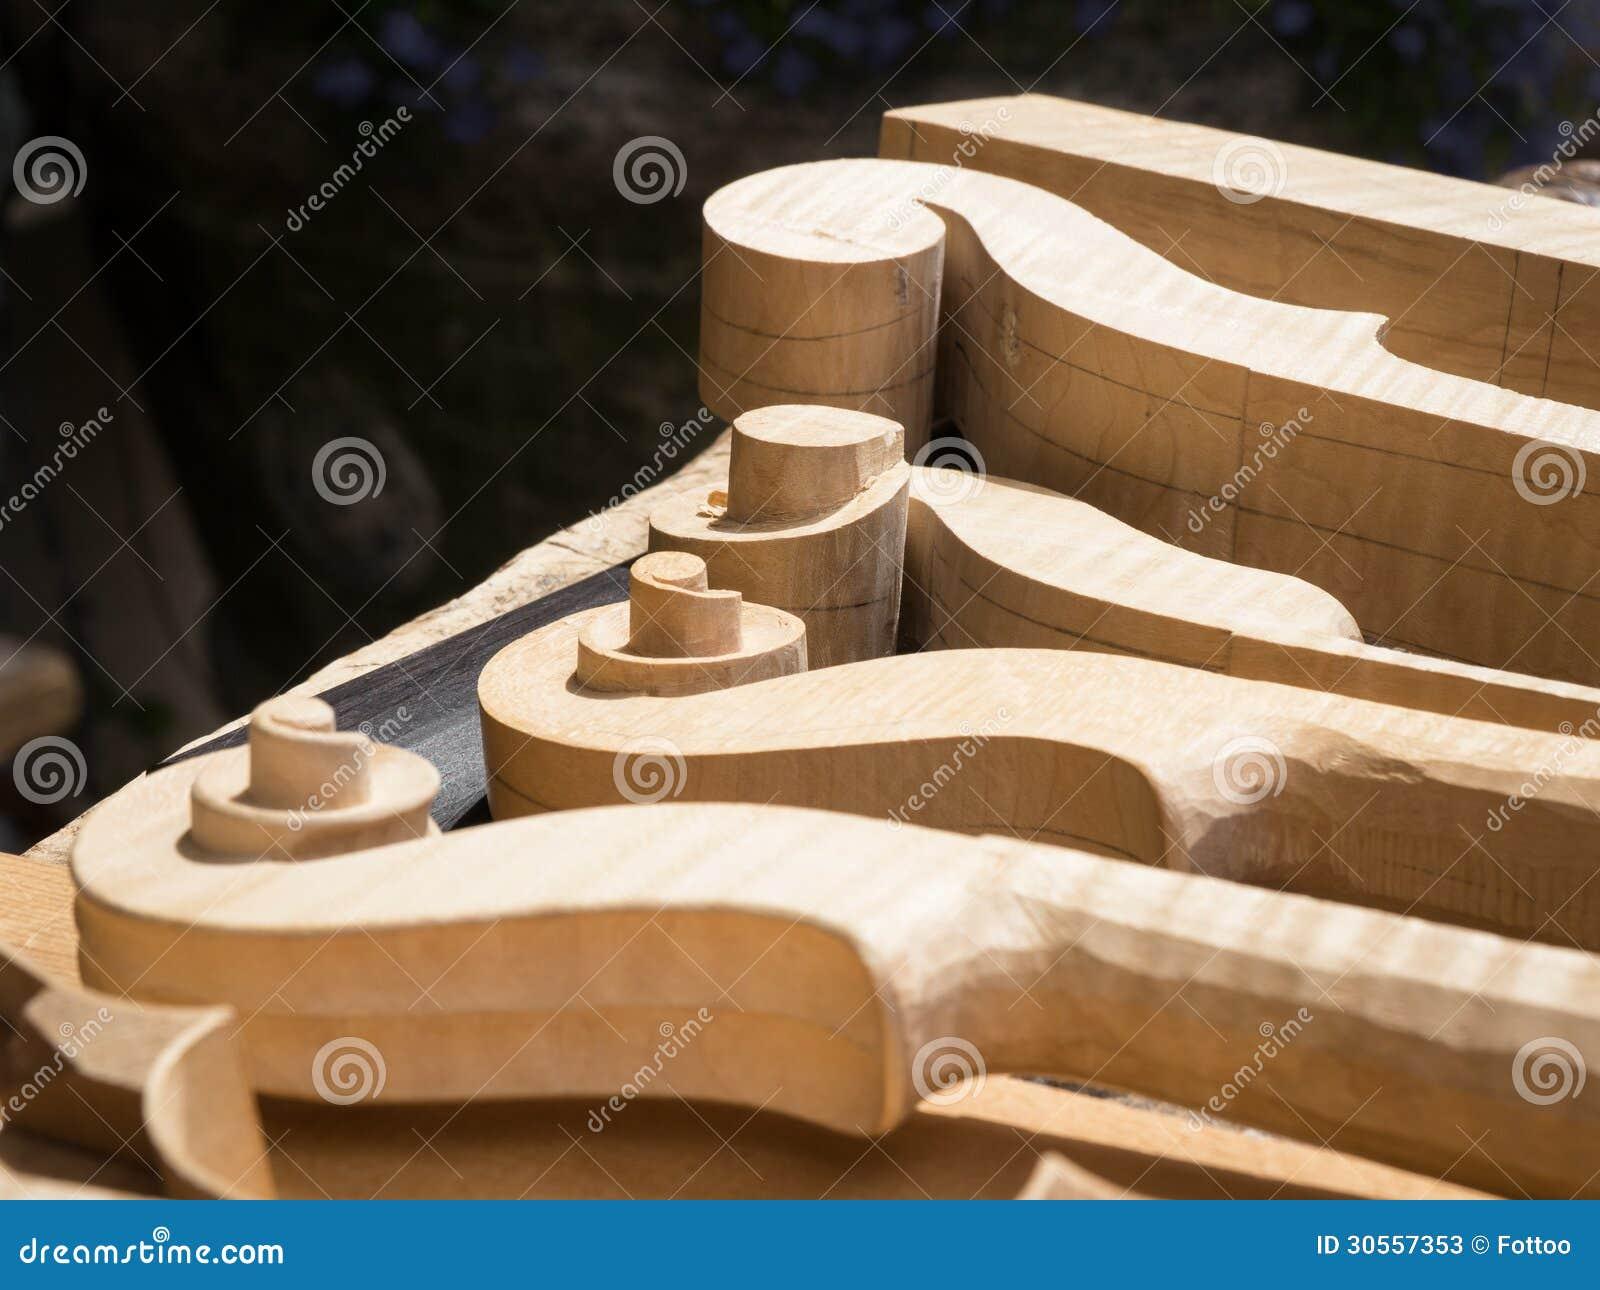 violin scrolls stock photos image 30557353. Black Bedroom Furniture Sets. Home Design Ideas